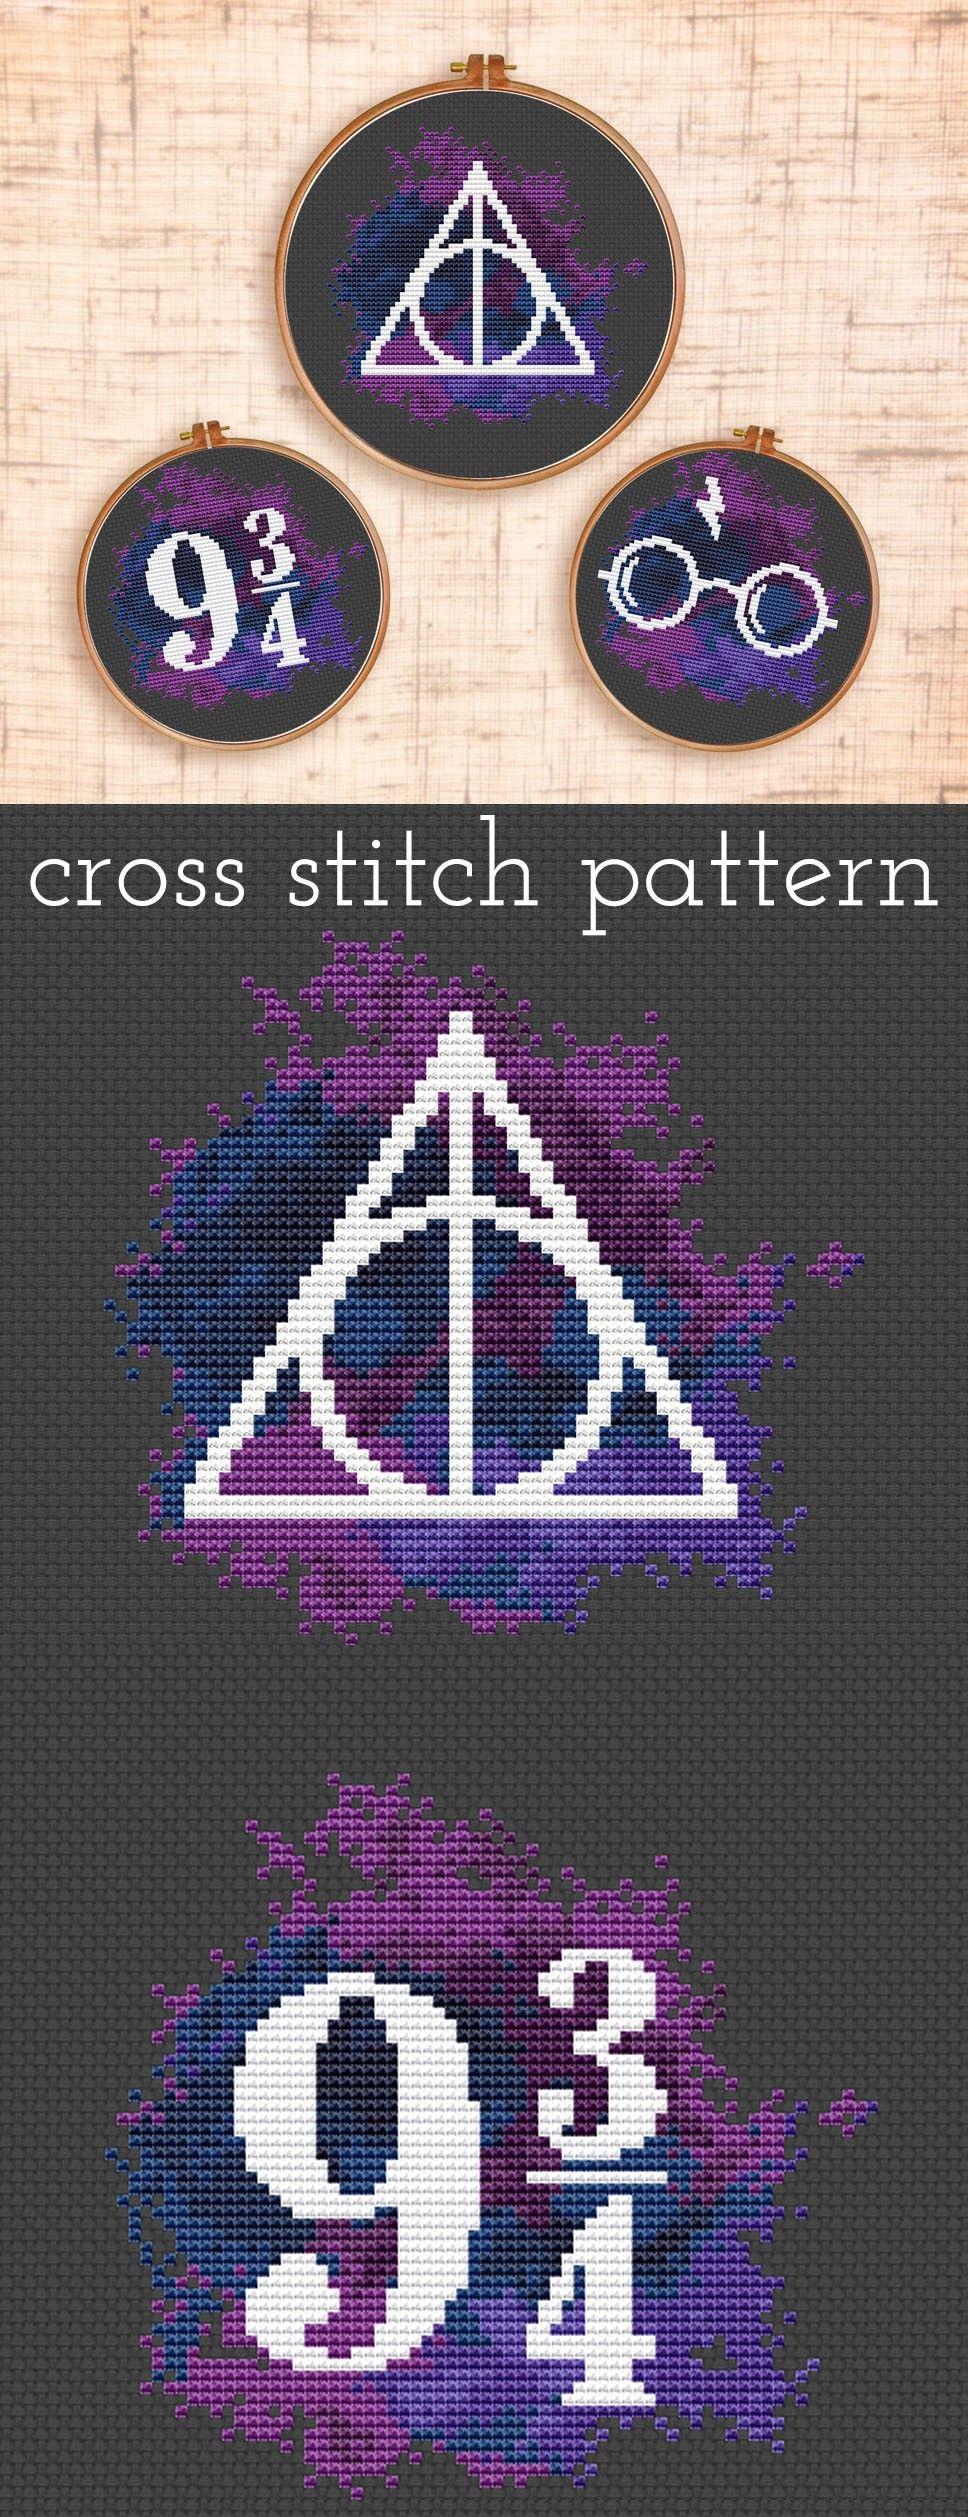 set of three harry potter cross stitch patterns platform 9 3 4 deathly hallows sticken. Black Bedroom Furniture Sets. Home Design Ideas